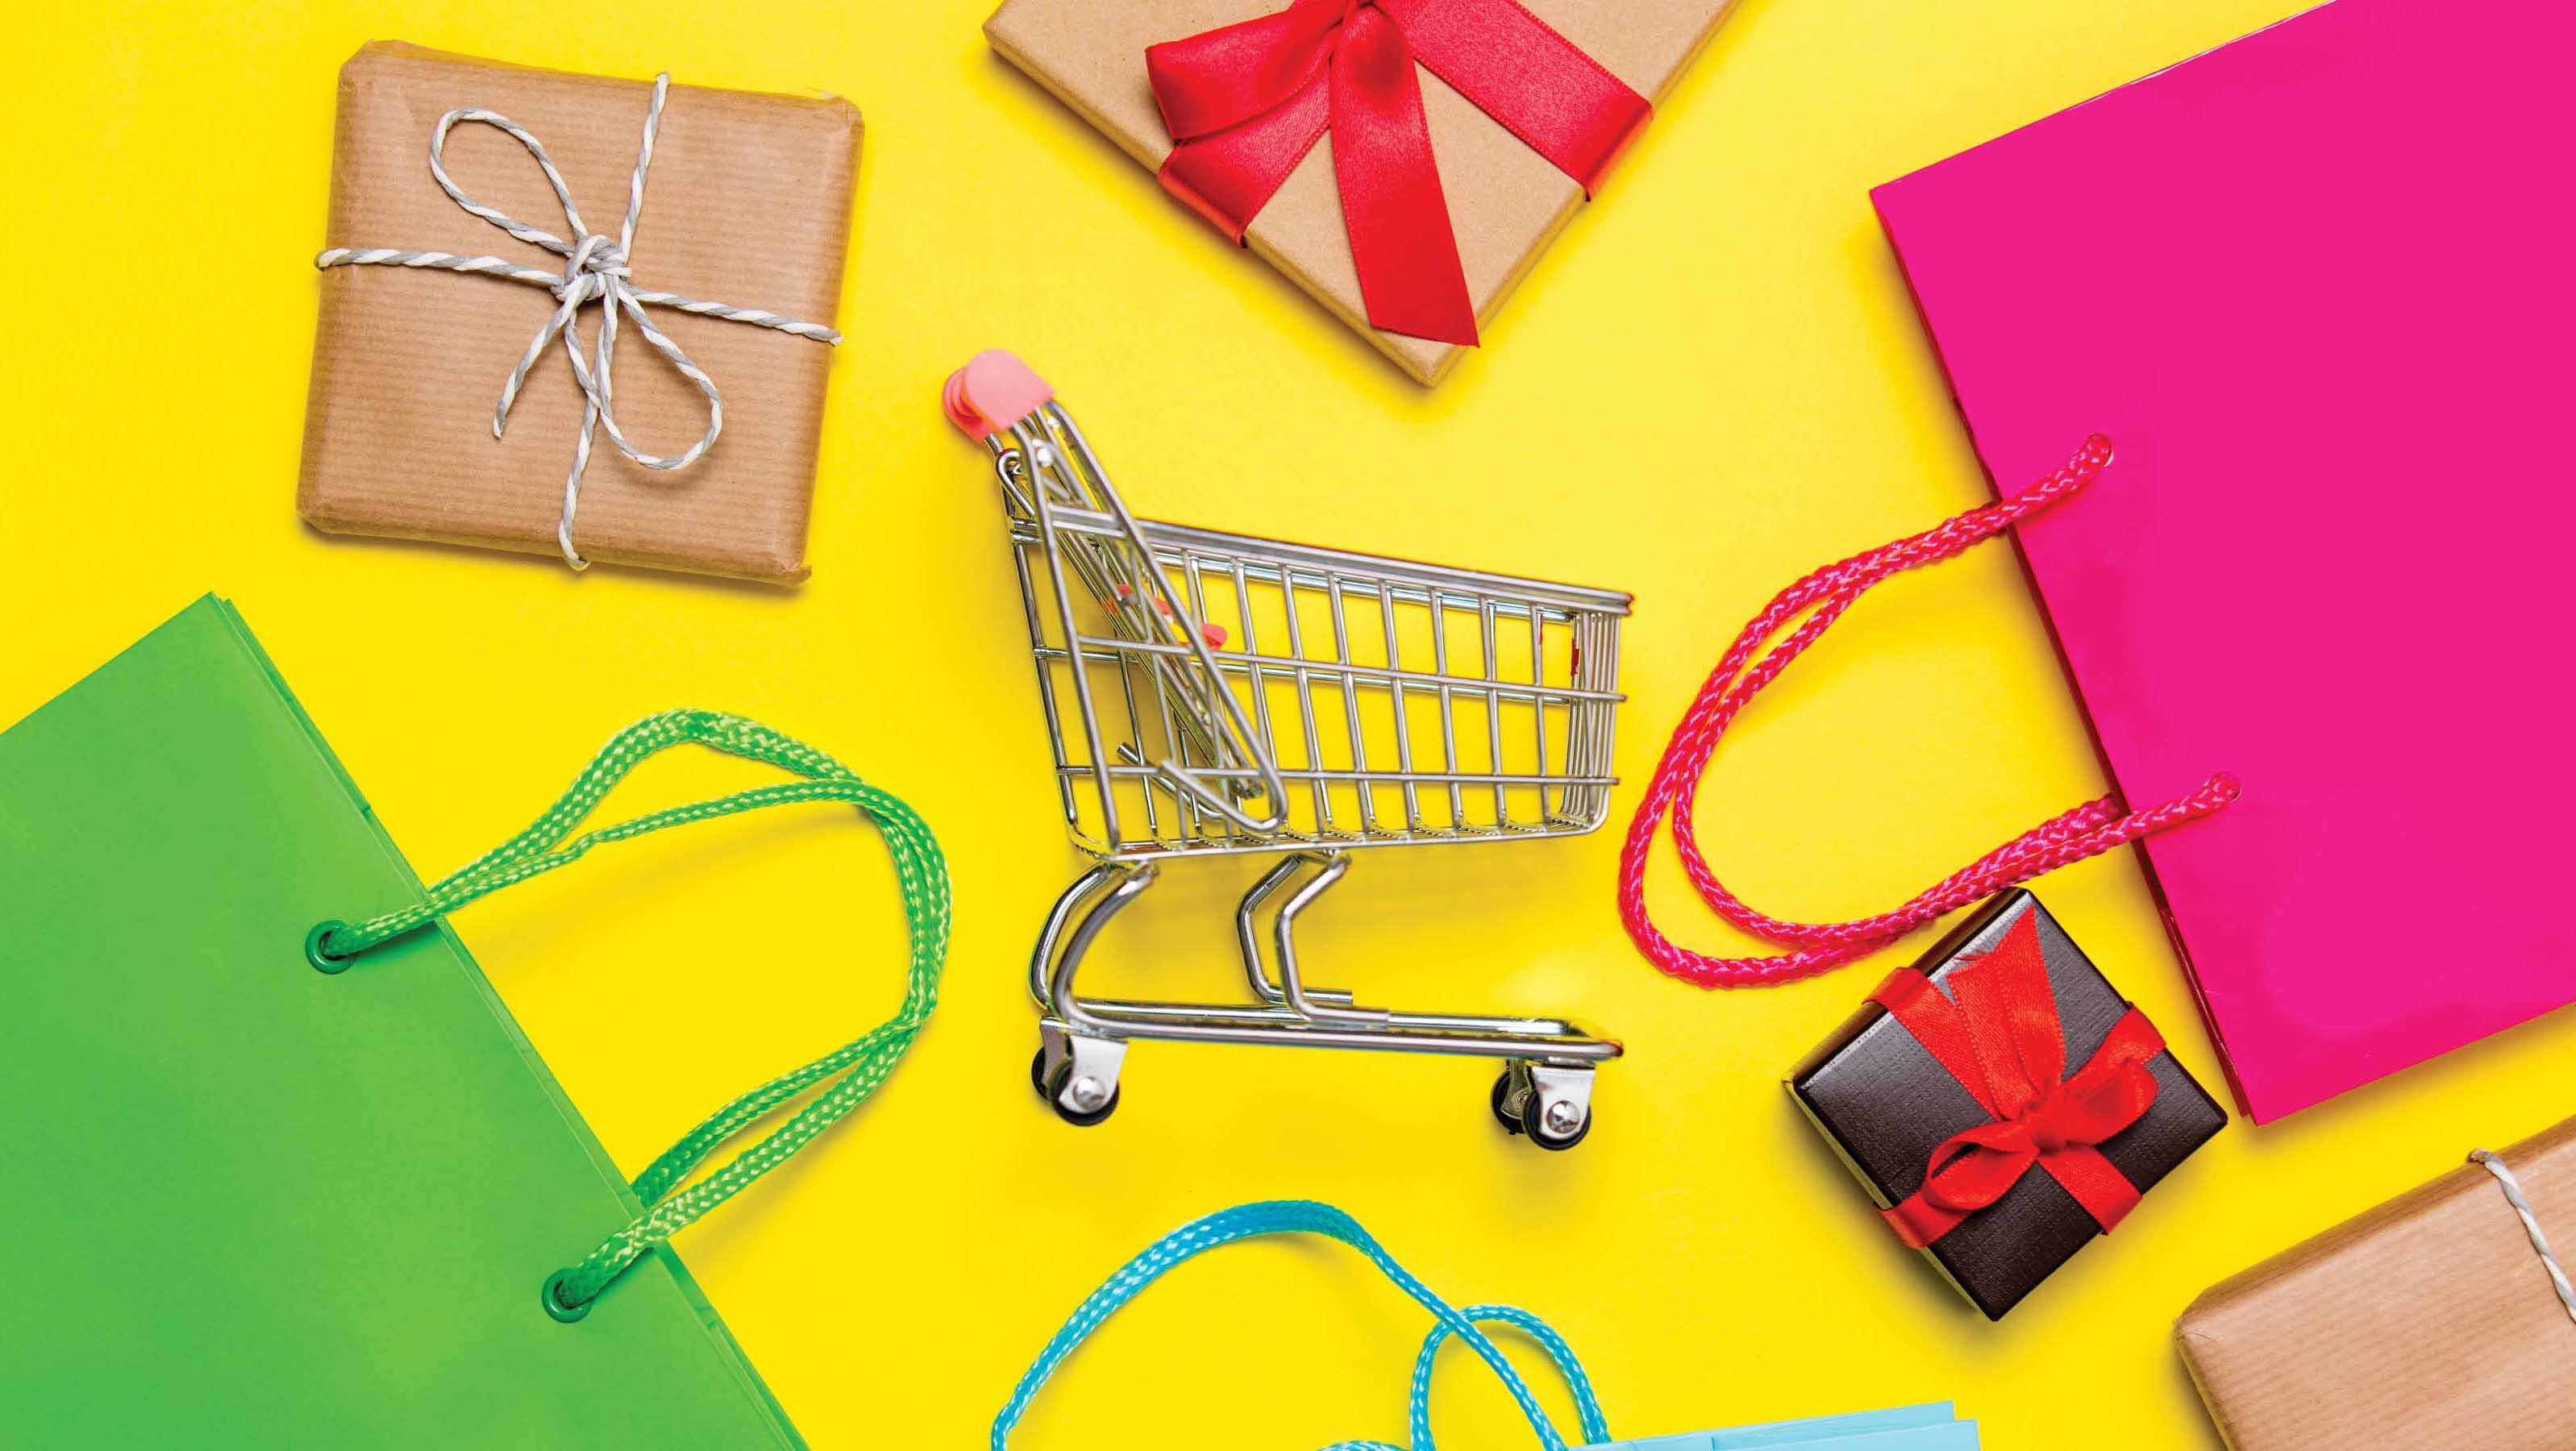 8 Ways to Optimize Your E-Commerce Website for Peak Shopping Season